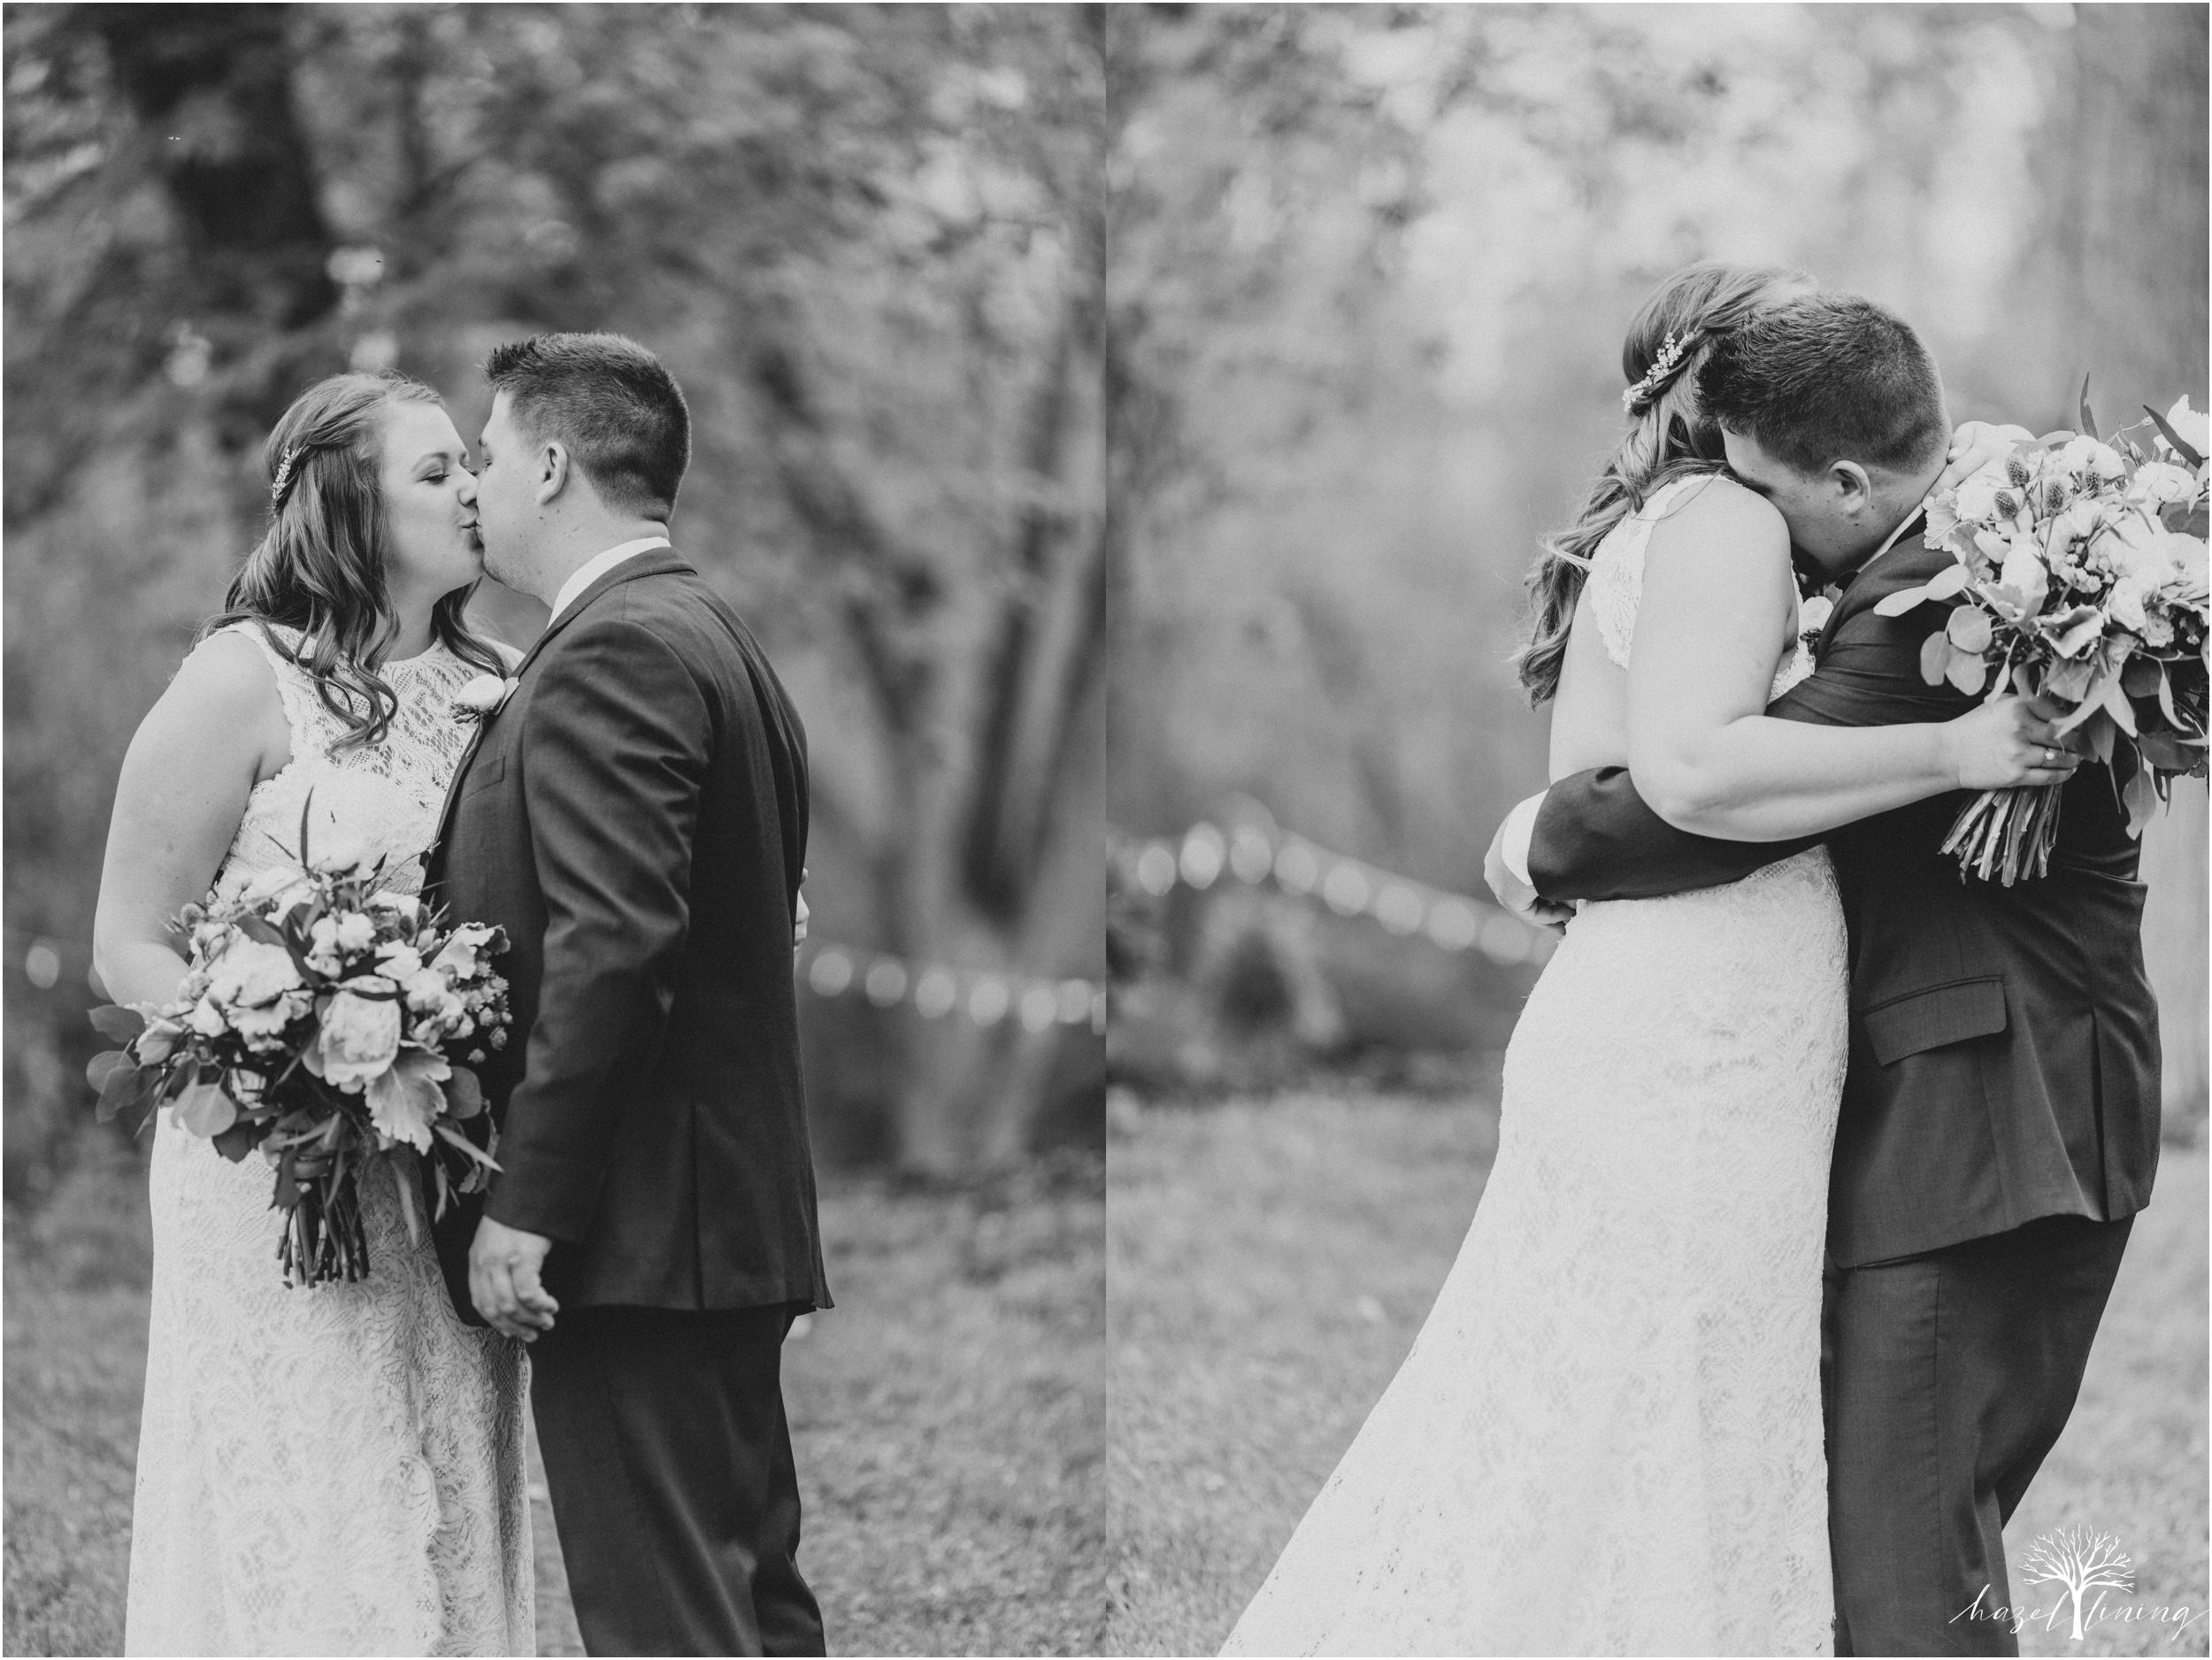 hazel-lining-travel-wedding-elopement-photography-abby-skyler-hunt-the-willis-house-york-pennsylvania-outdoor-estate-wedding_0027.jpg